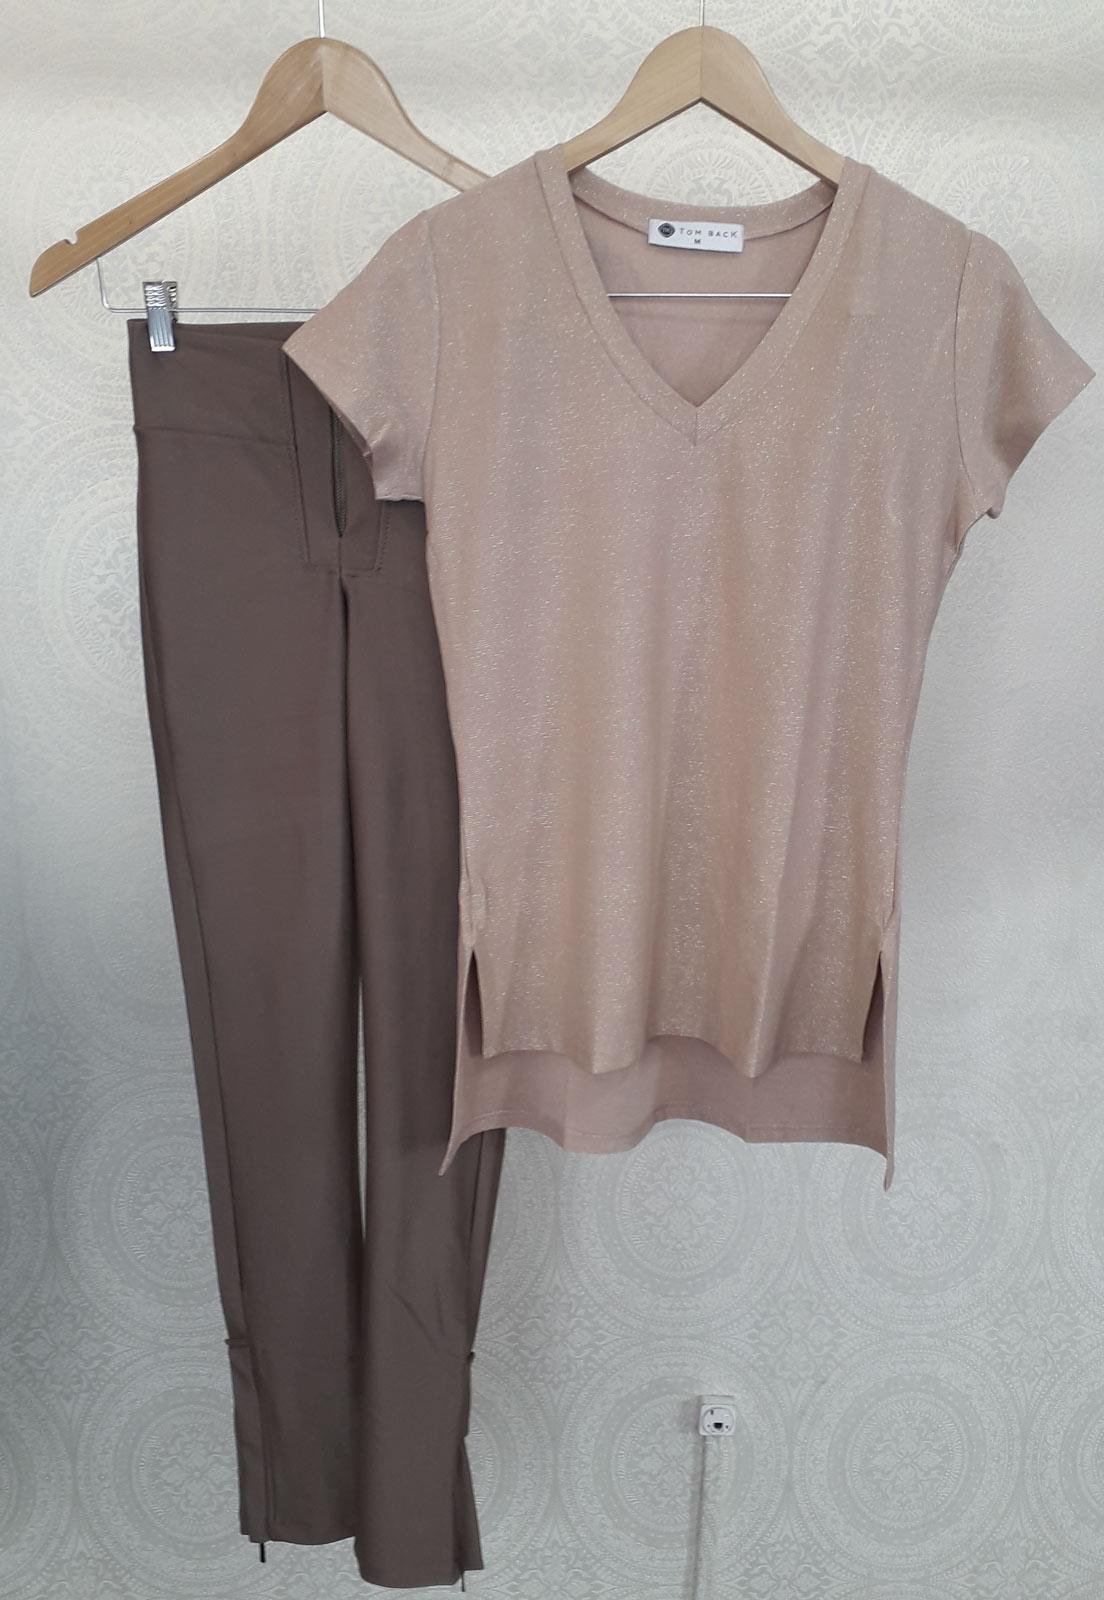 T-shirt Lurex Gold + Calça Basic Prada Bronze